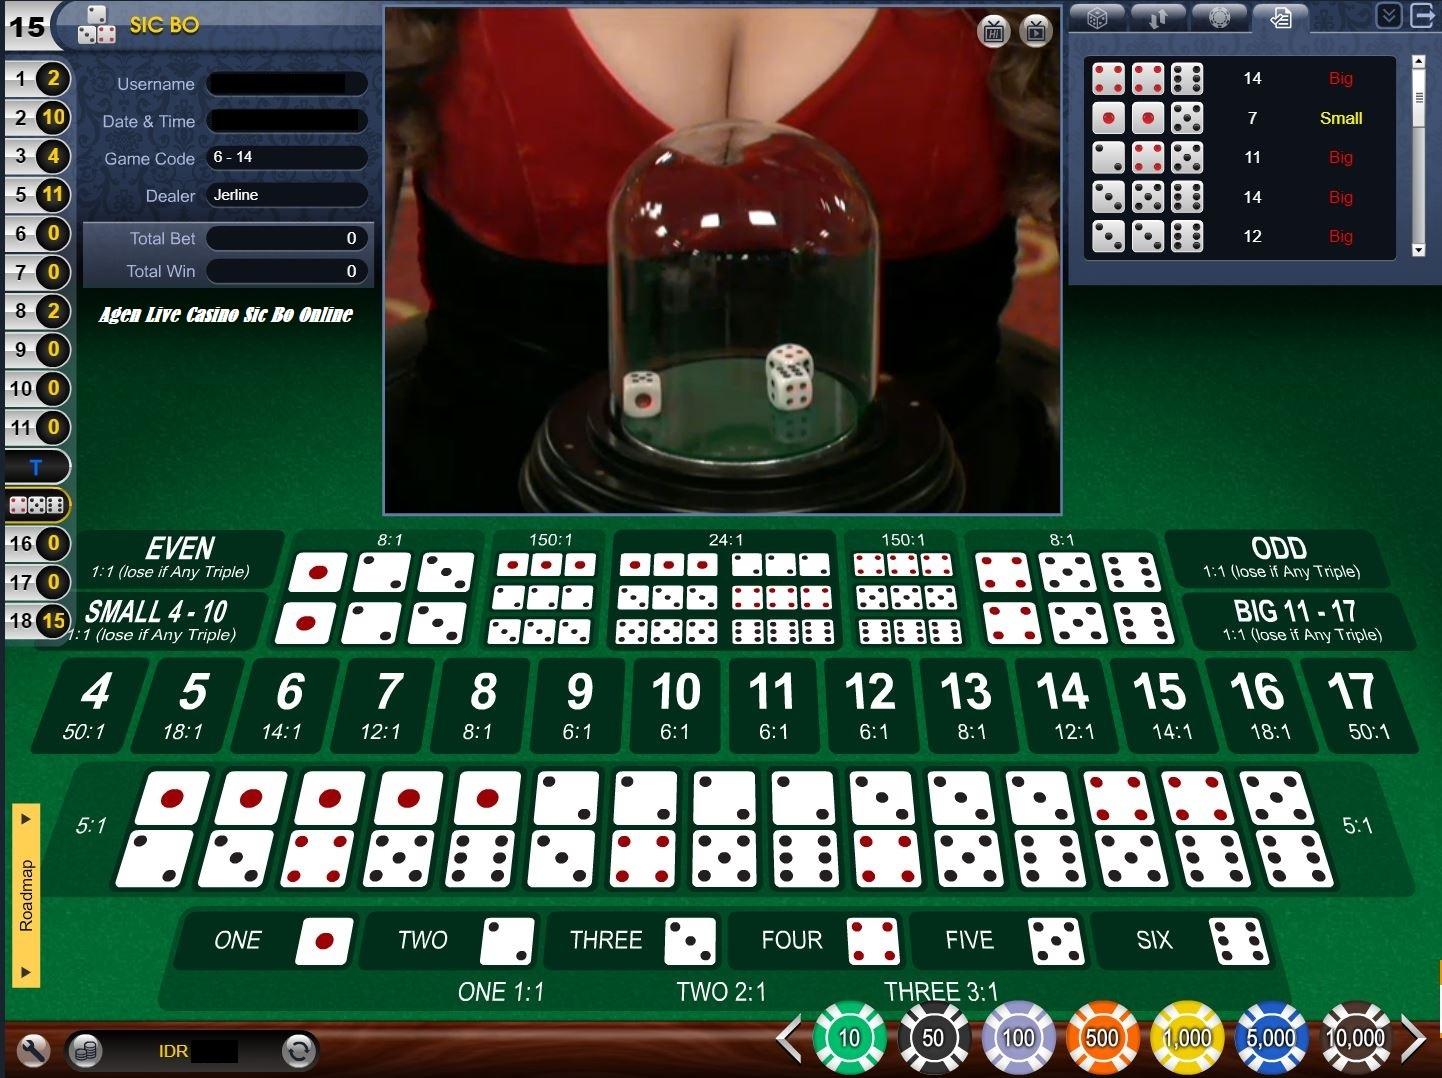 Agen Live Casino Sic Bo Online